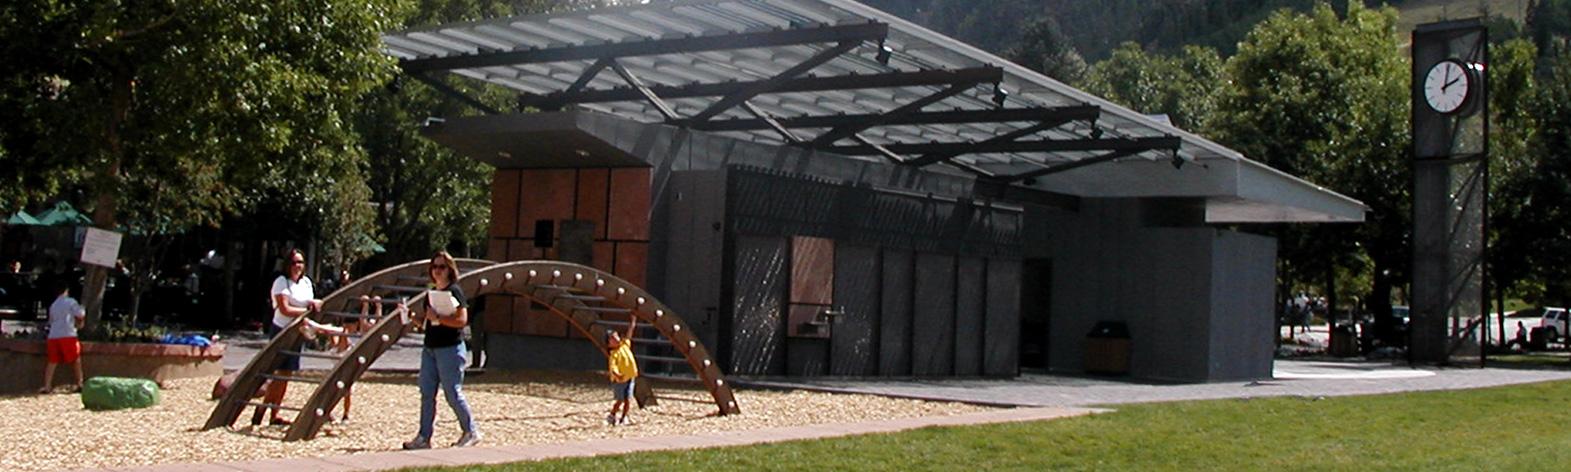 Wagner Park Edge Pavilion